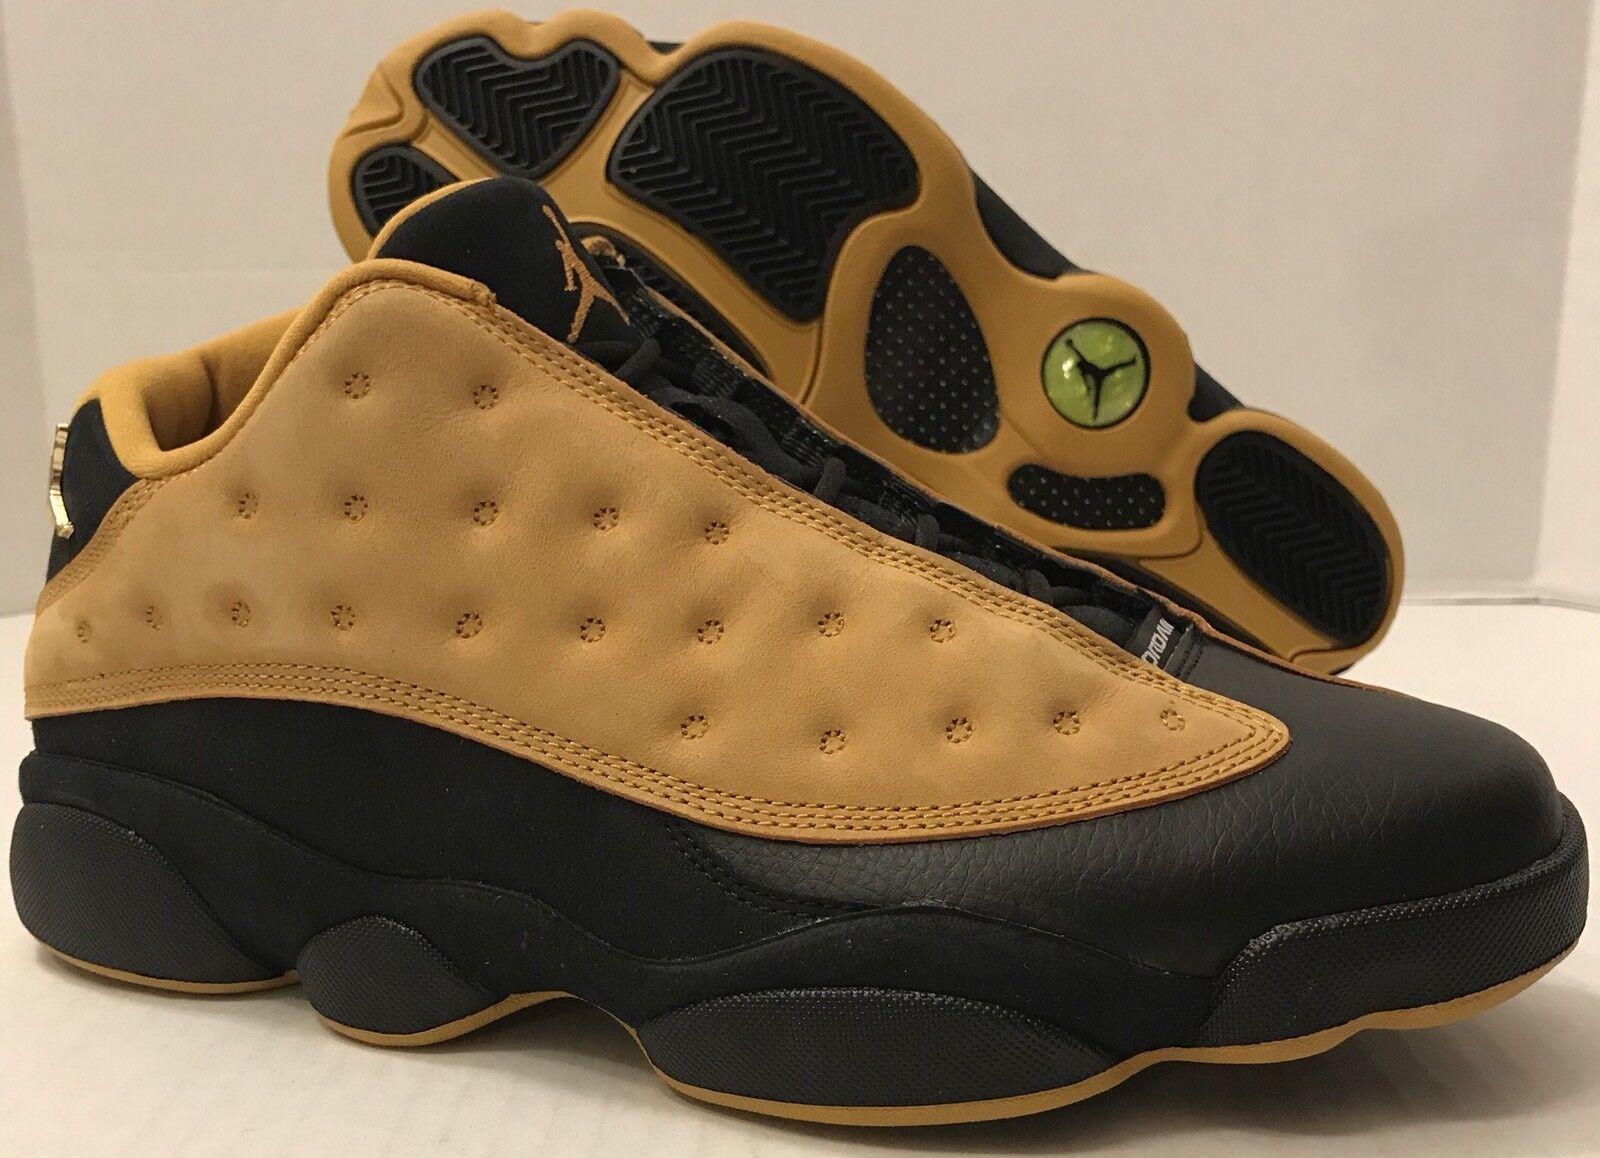 Nike air jordan 13 retr basso 310810-022 310810-022 310810-022 nero / chutney (uomini e 10) 2b4f0c